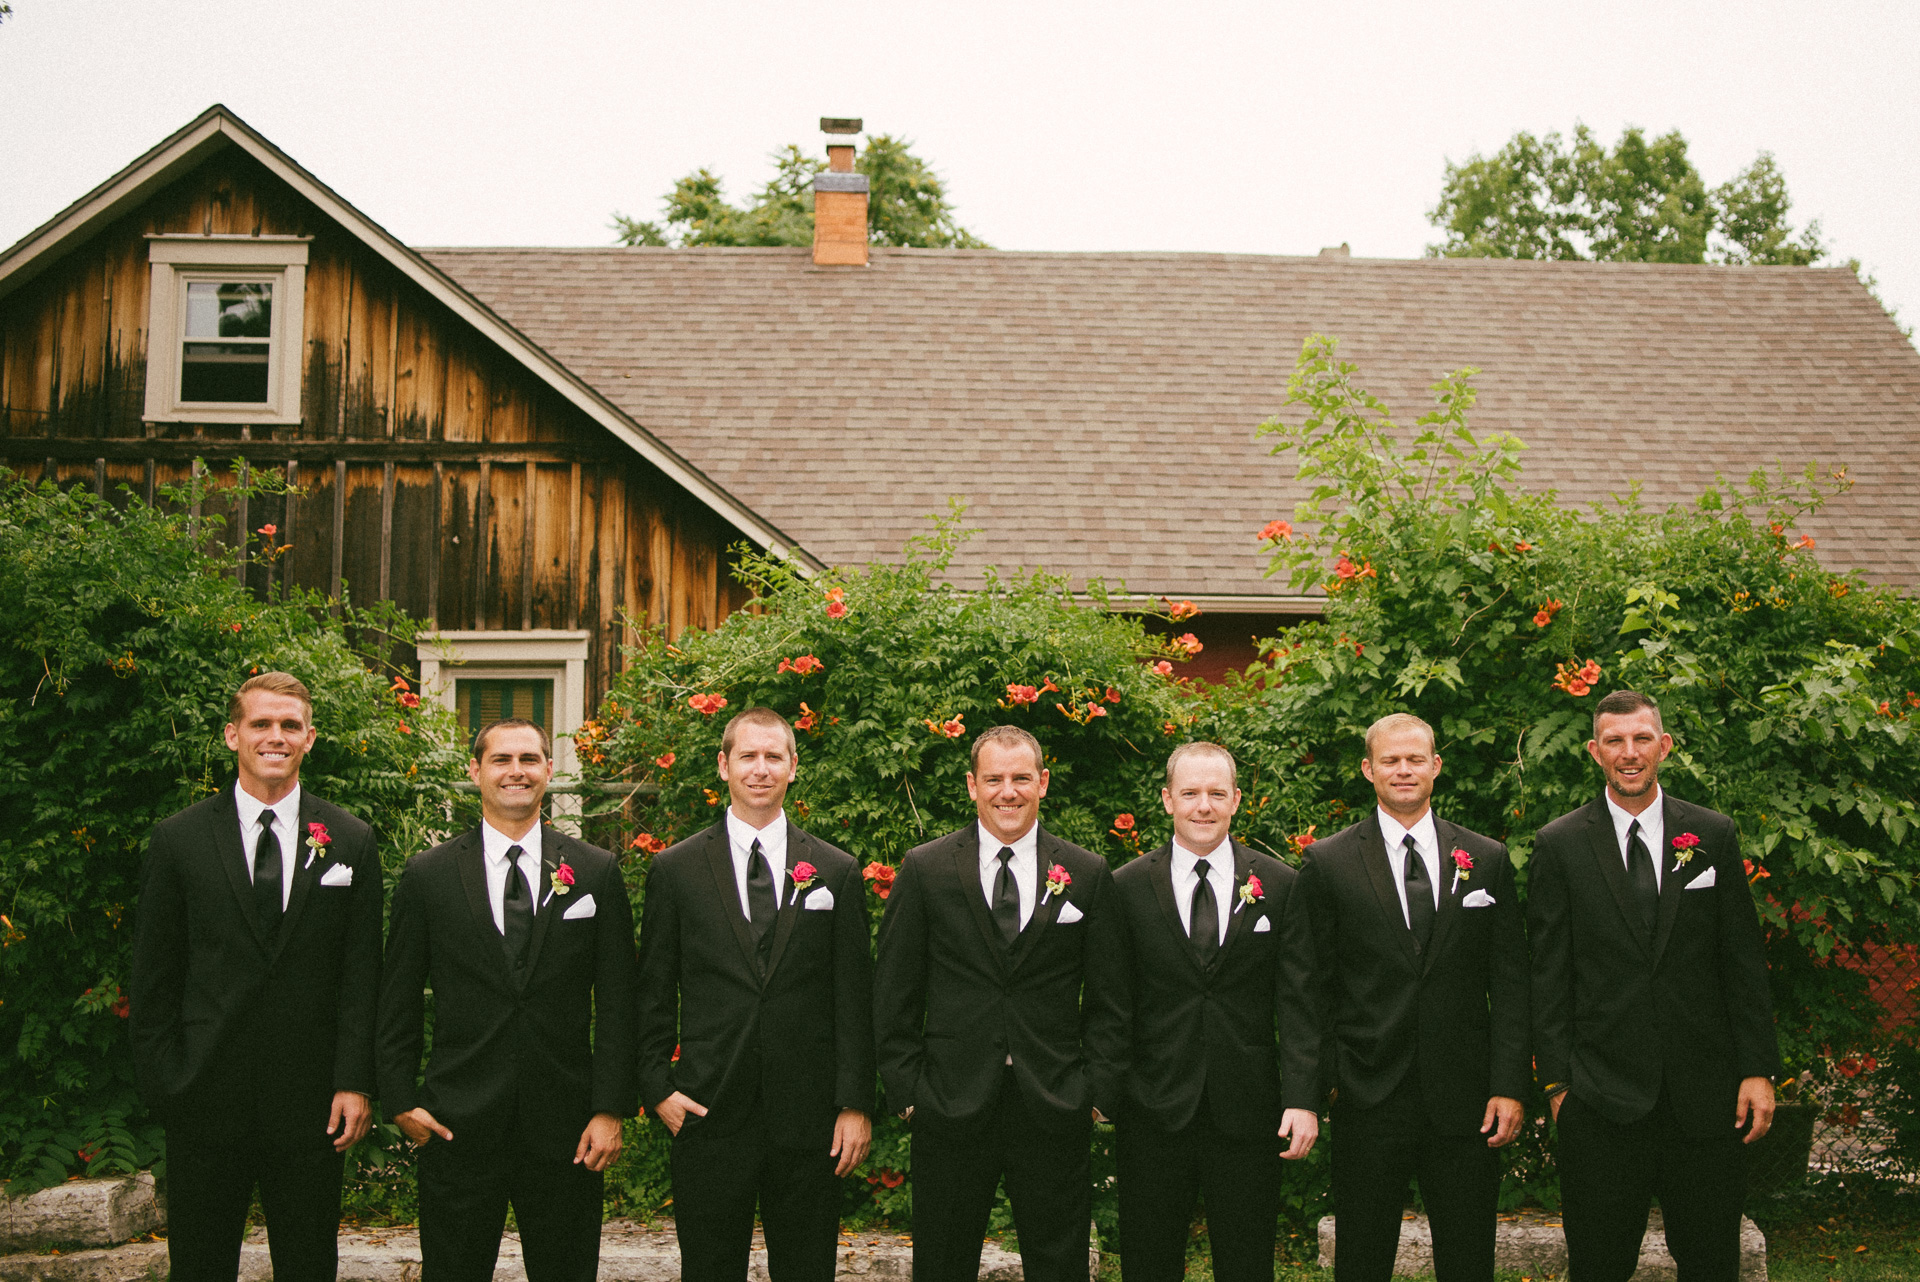 Dayton Wedding Photographer - Groomsmen